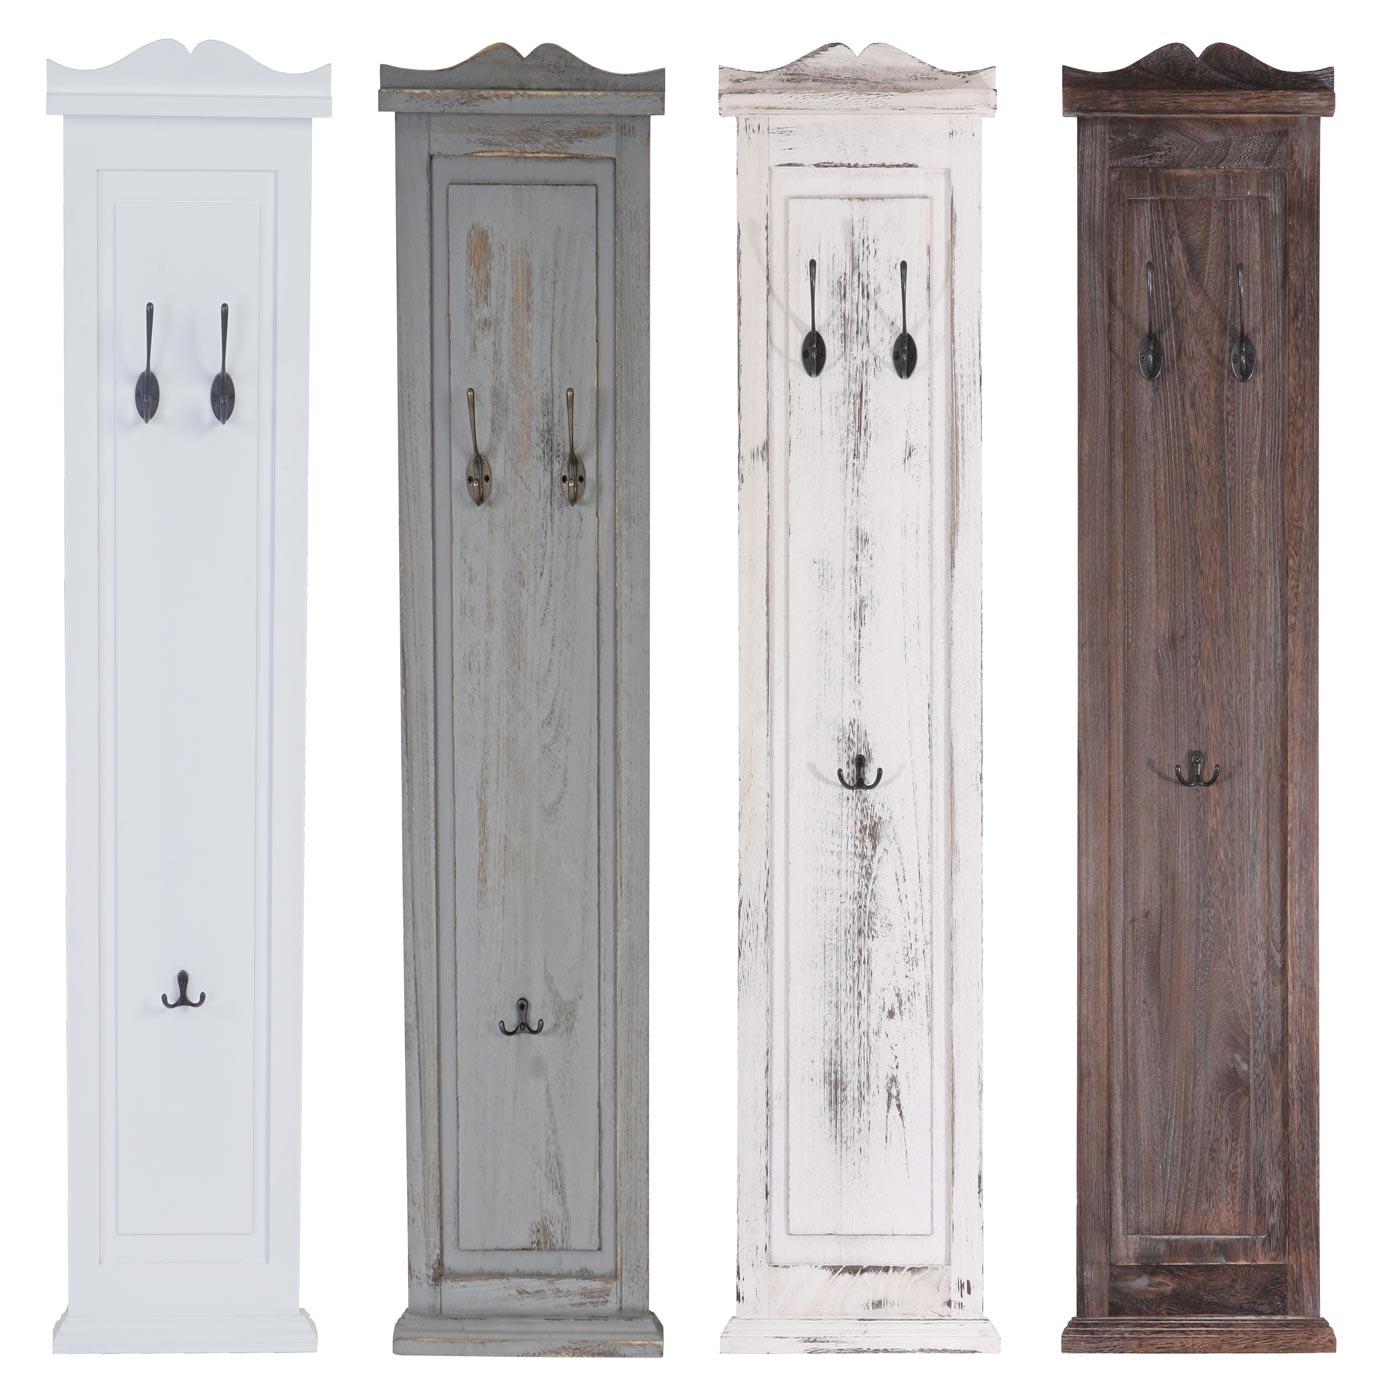 Wundervoll Garderobenpaneel Buche Dekoration Von 2x Garderobe Wandgarderobe Wandhaken 109x28x4cm ~ Weiß